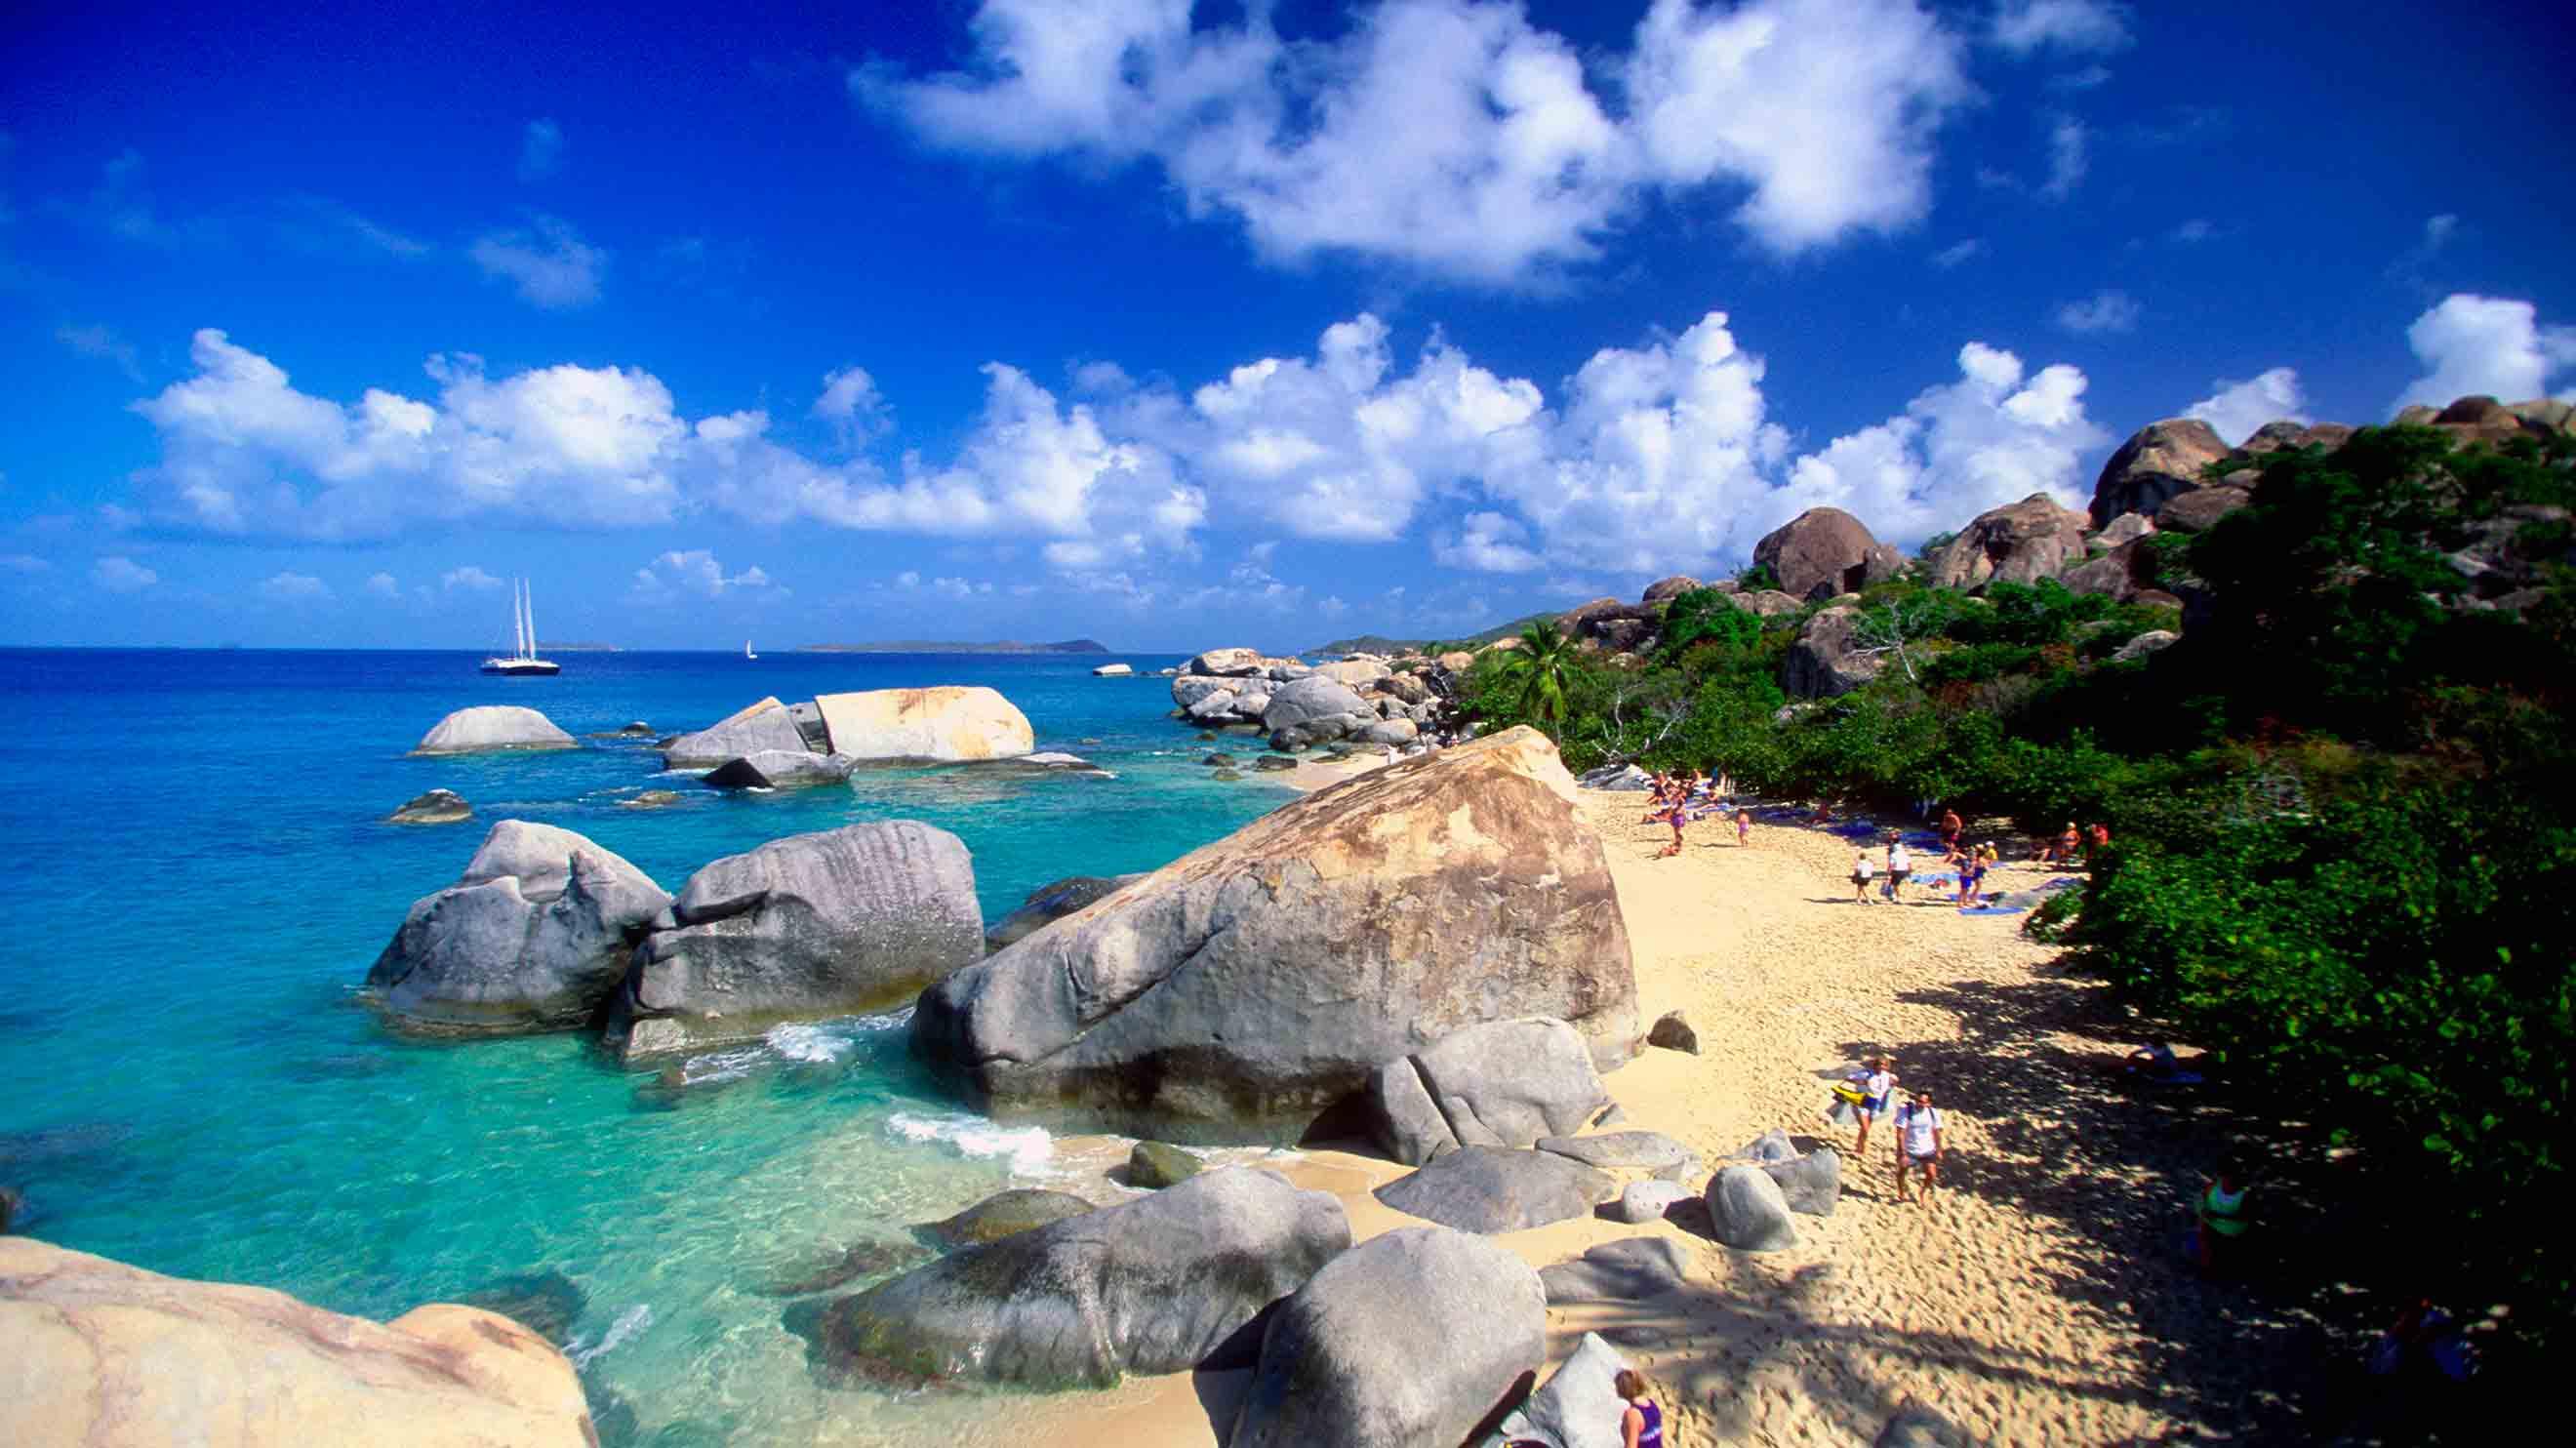 The Baths, Virgin Gorda Island, British Virgin Islands, West Indies  № 1471421 загрузить